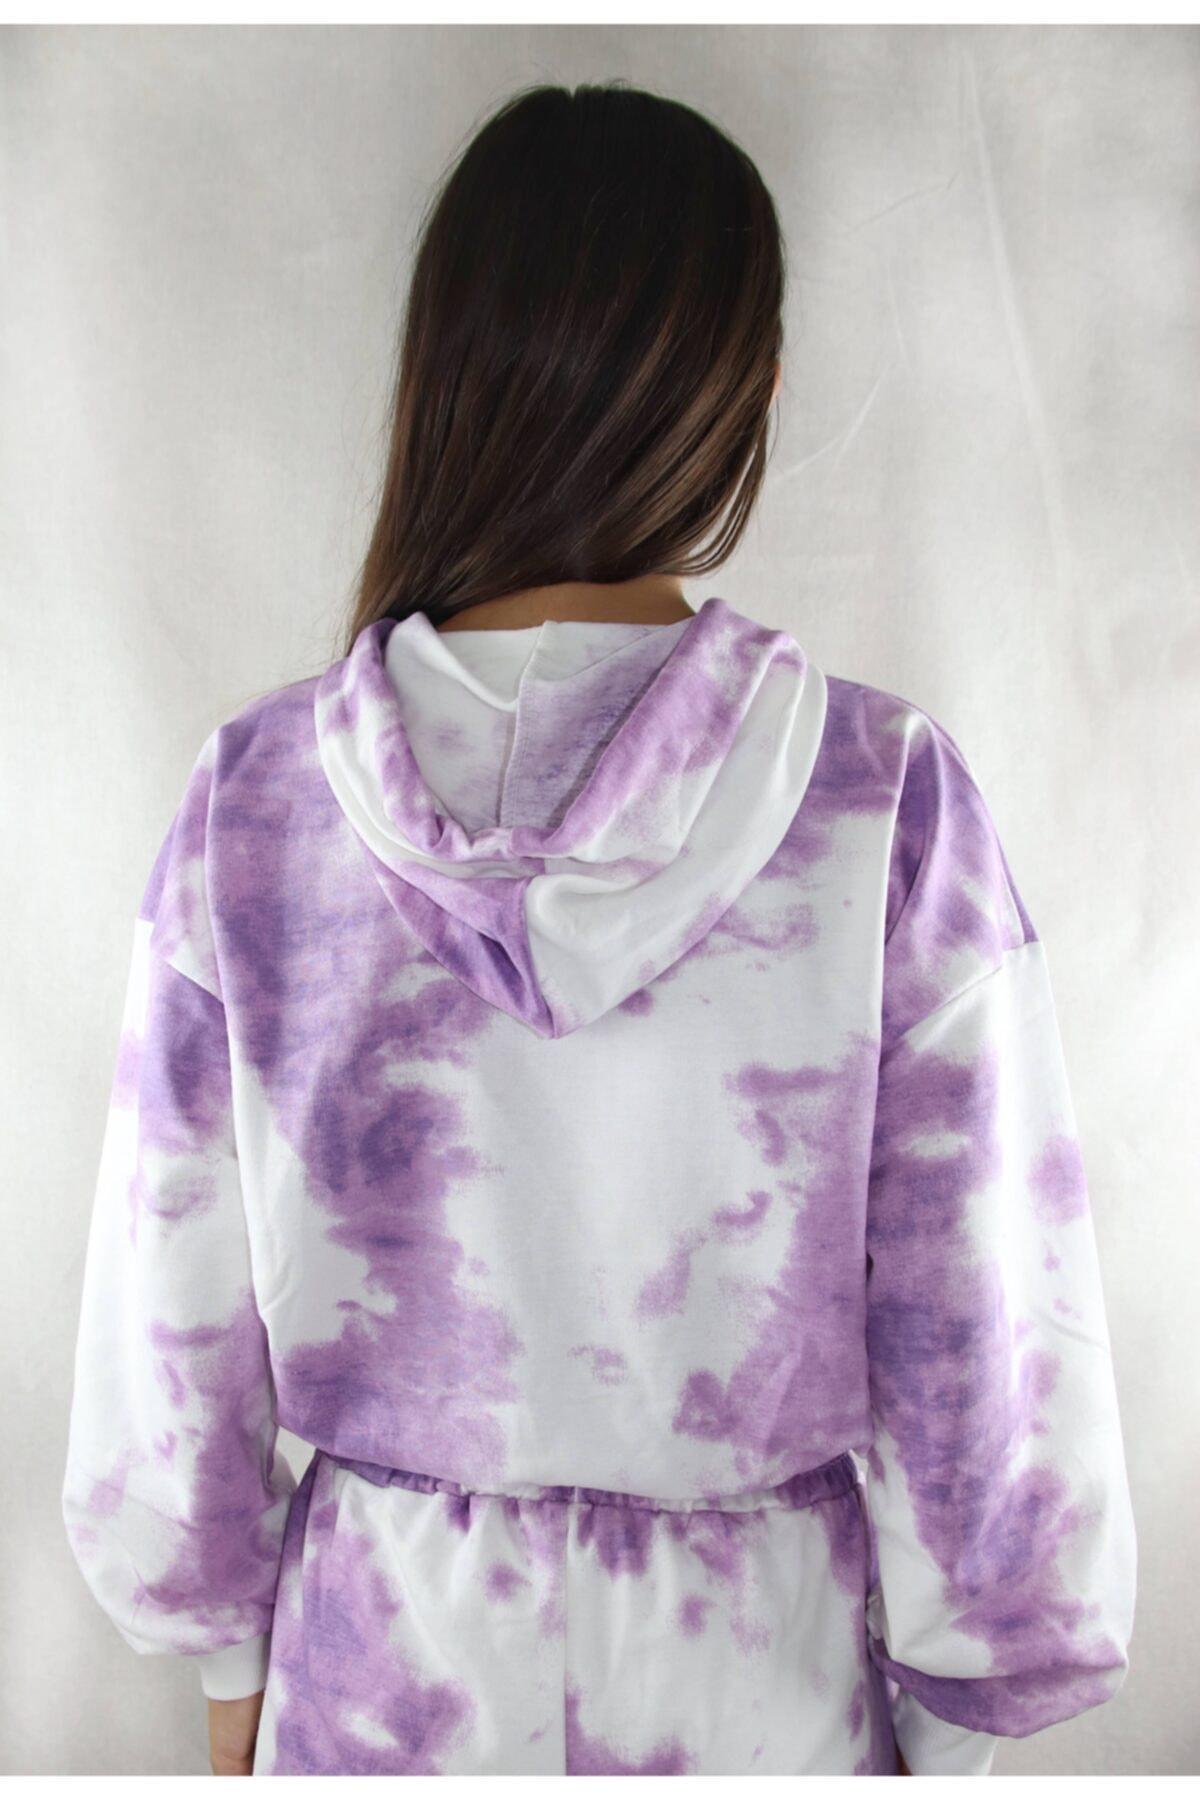 Anita Store Batik Beli Lastikli Sweatshirt 2